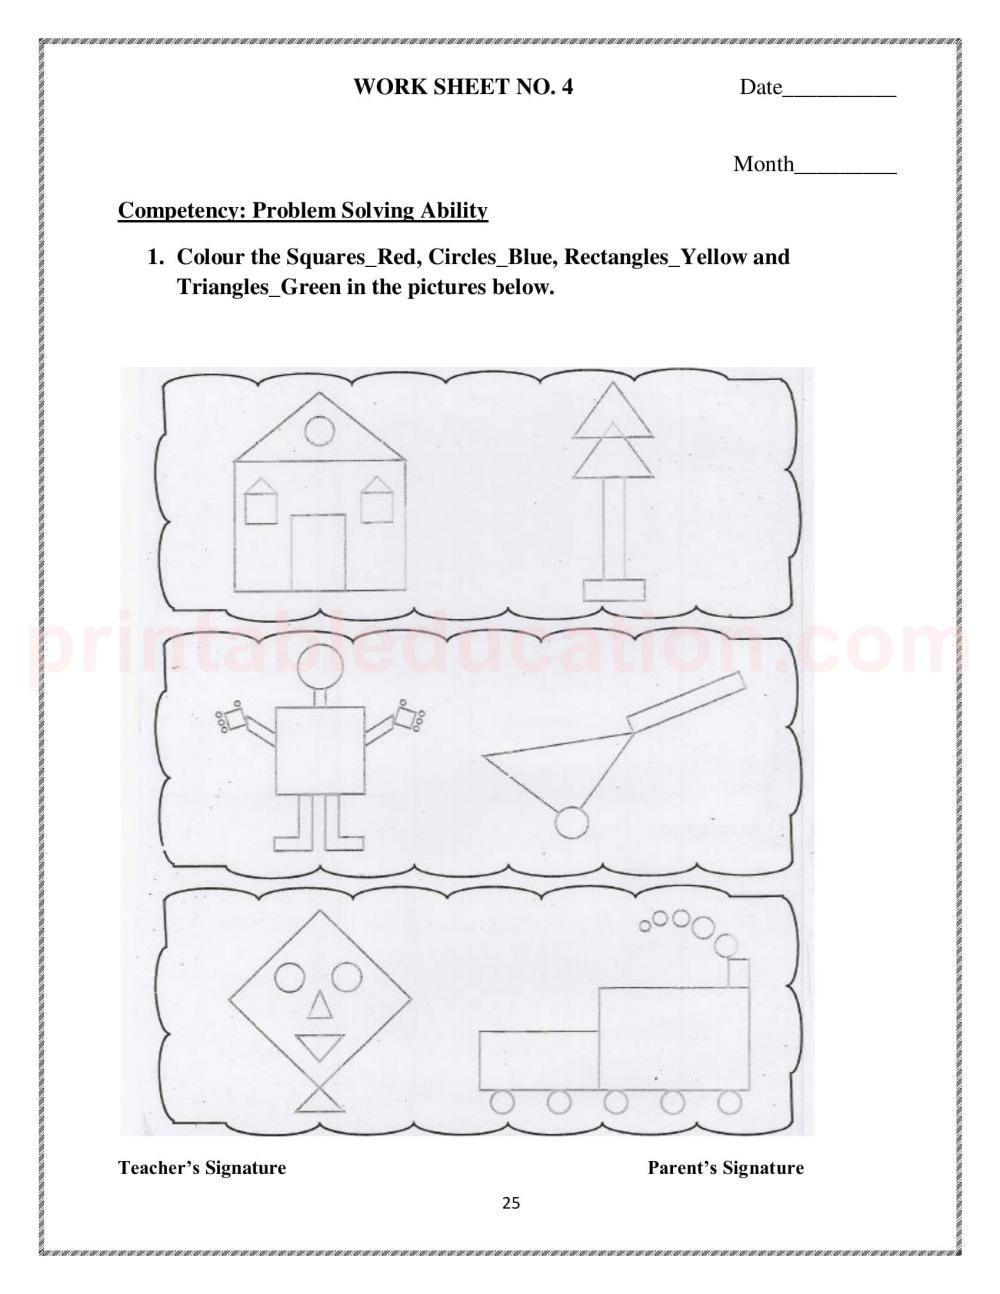 medium resolution of Basic Math Shapes Worksheets For Kids   PrintablEducation